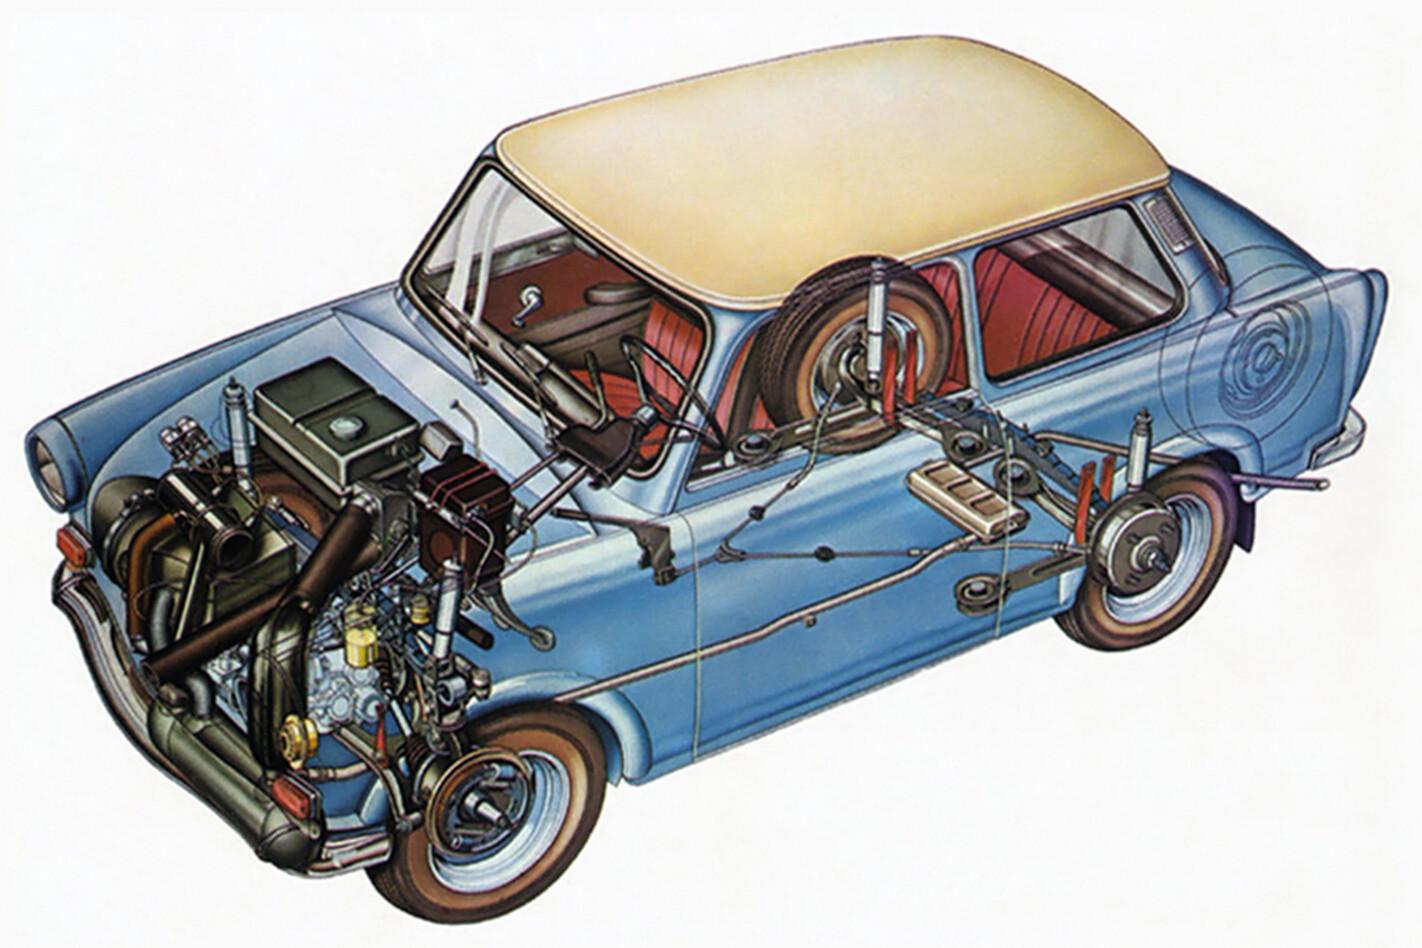 1964 Trabant 601 Cutaway 02 Jpg